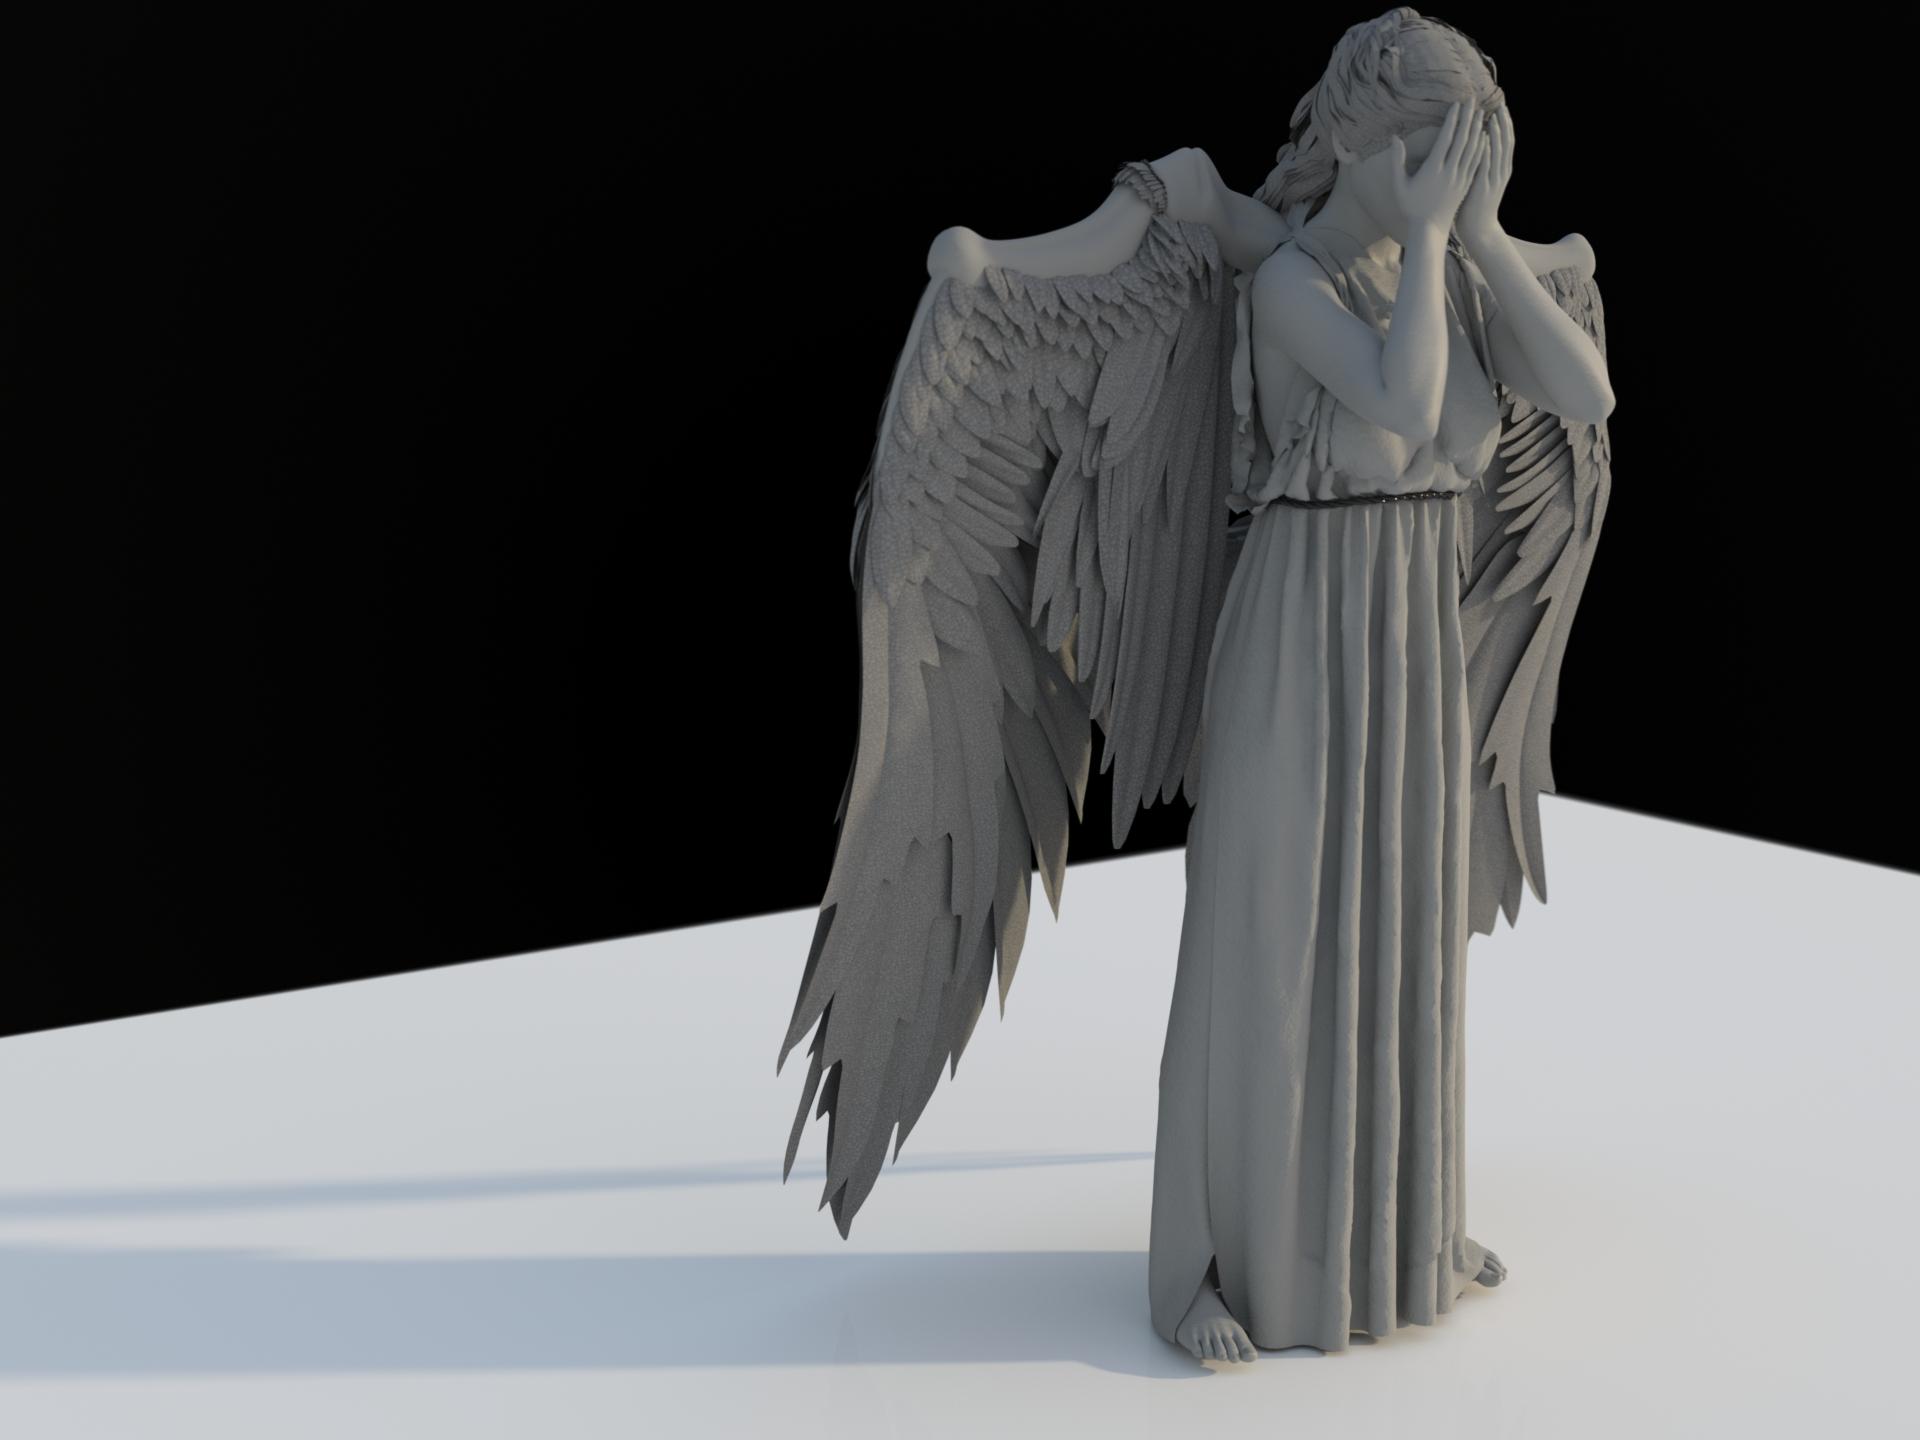 19-11-Angels Glare Test0